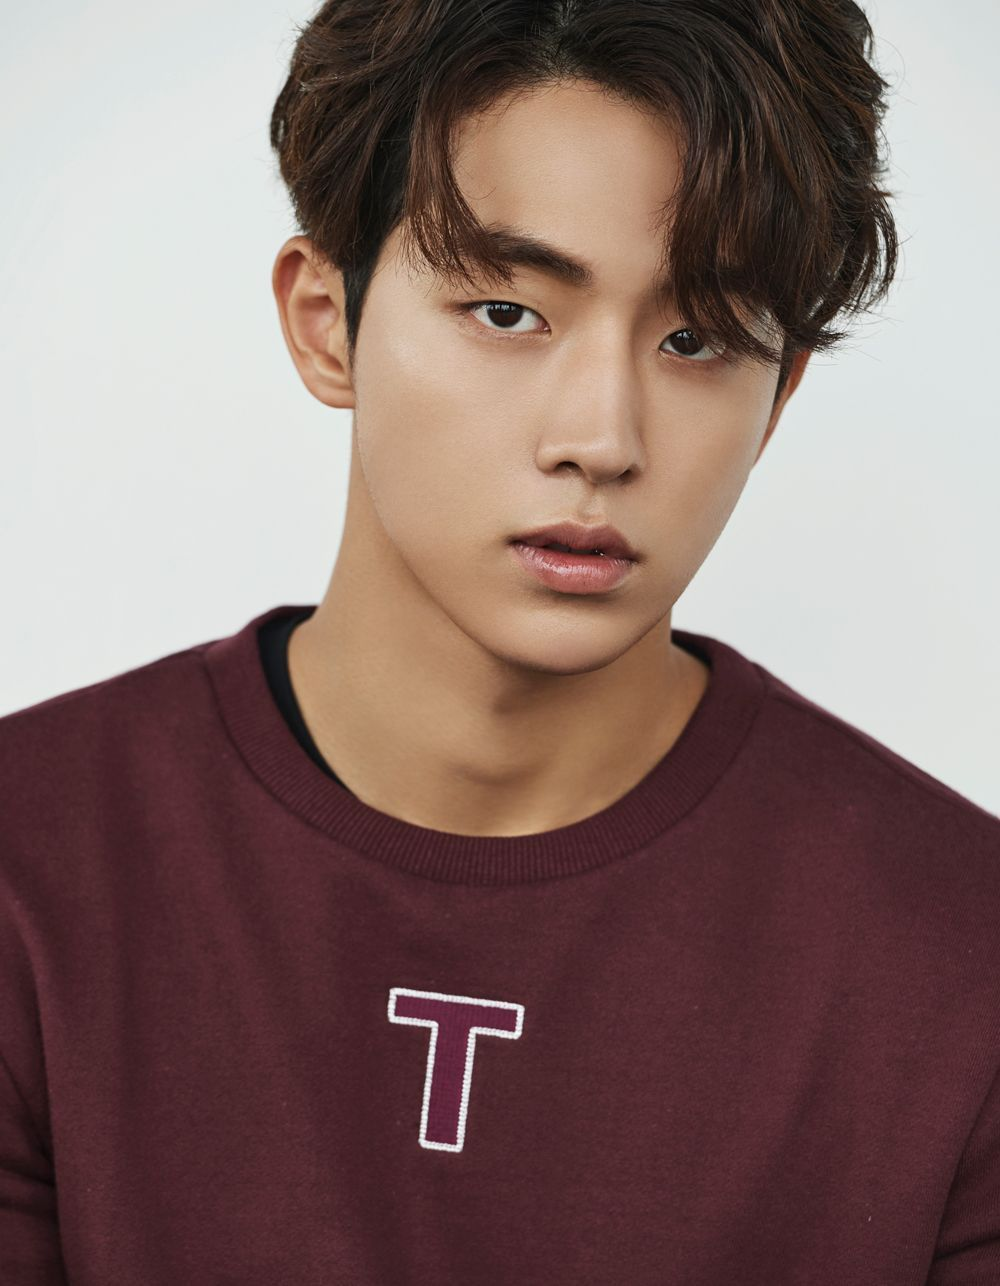 Heisse Asiatische Frisuren Fur Jungs Neu Haar Frisuren 2018 Asiatische Frisuren Koreanische Jungs Koreanische Manner Frisur